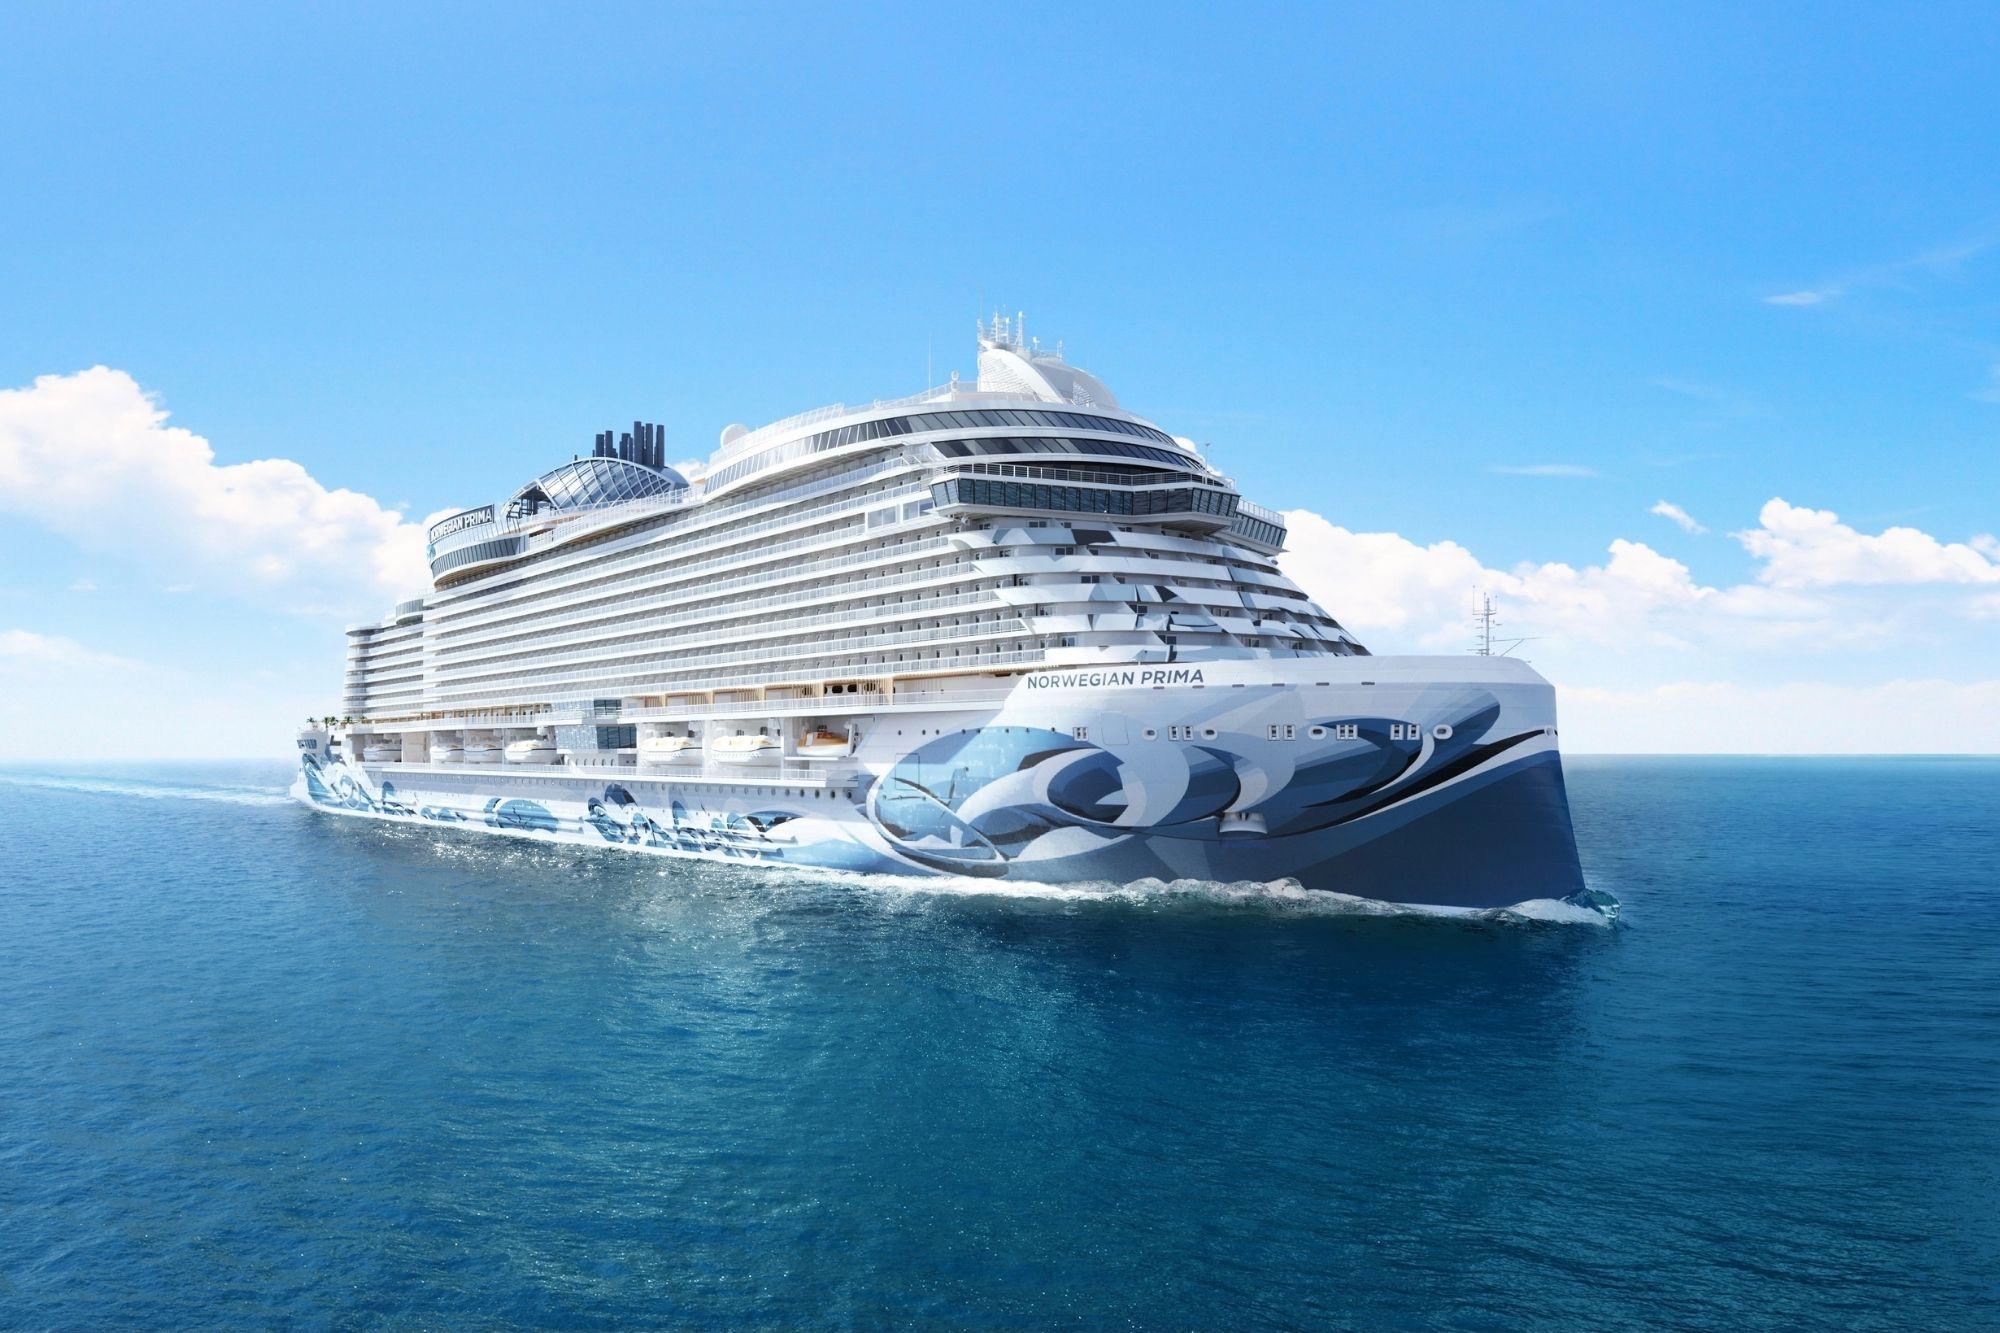 Norwegian Cruise Line stellt Neubau Norwegian Prima vor